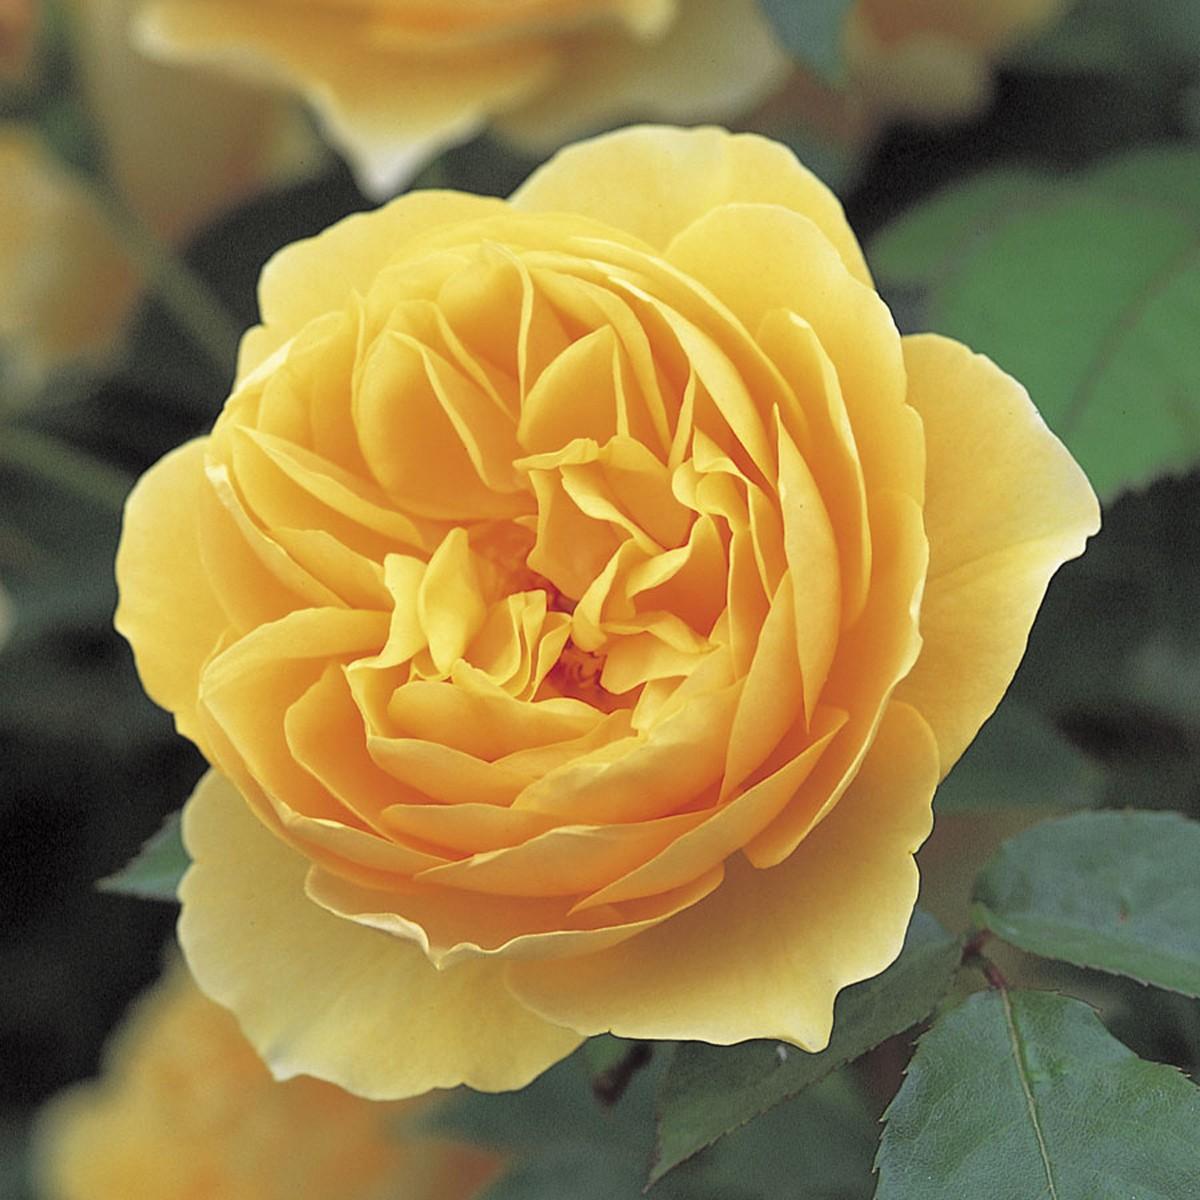 Rose graham thomas 2